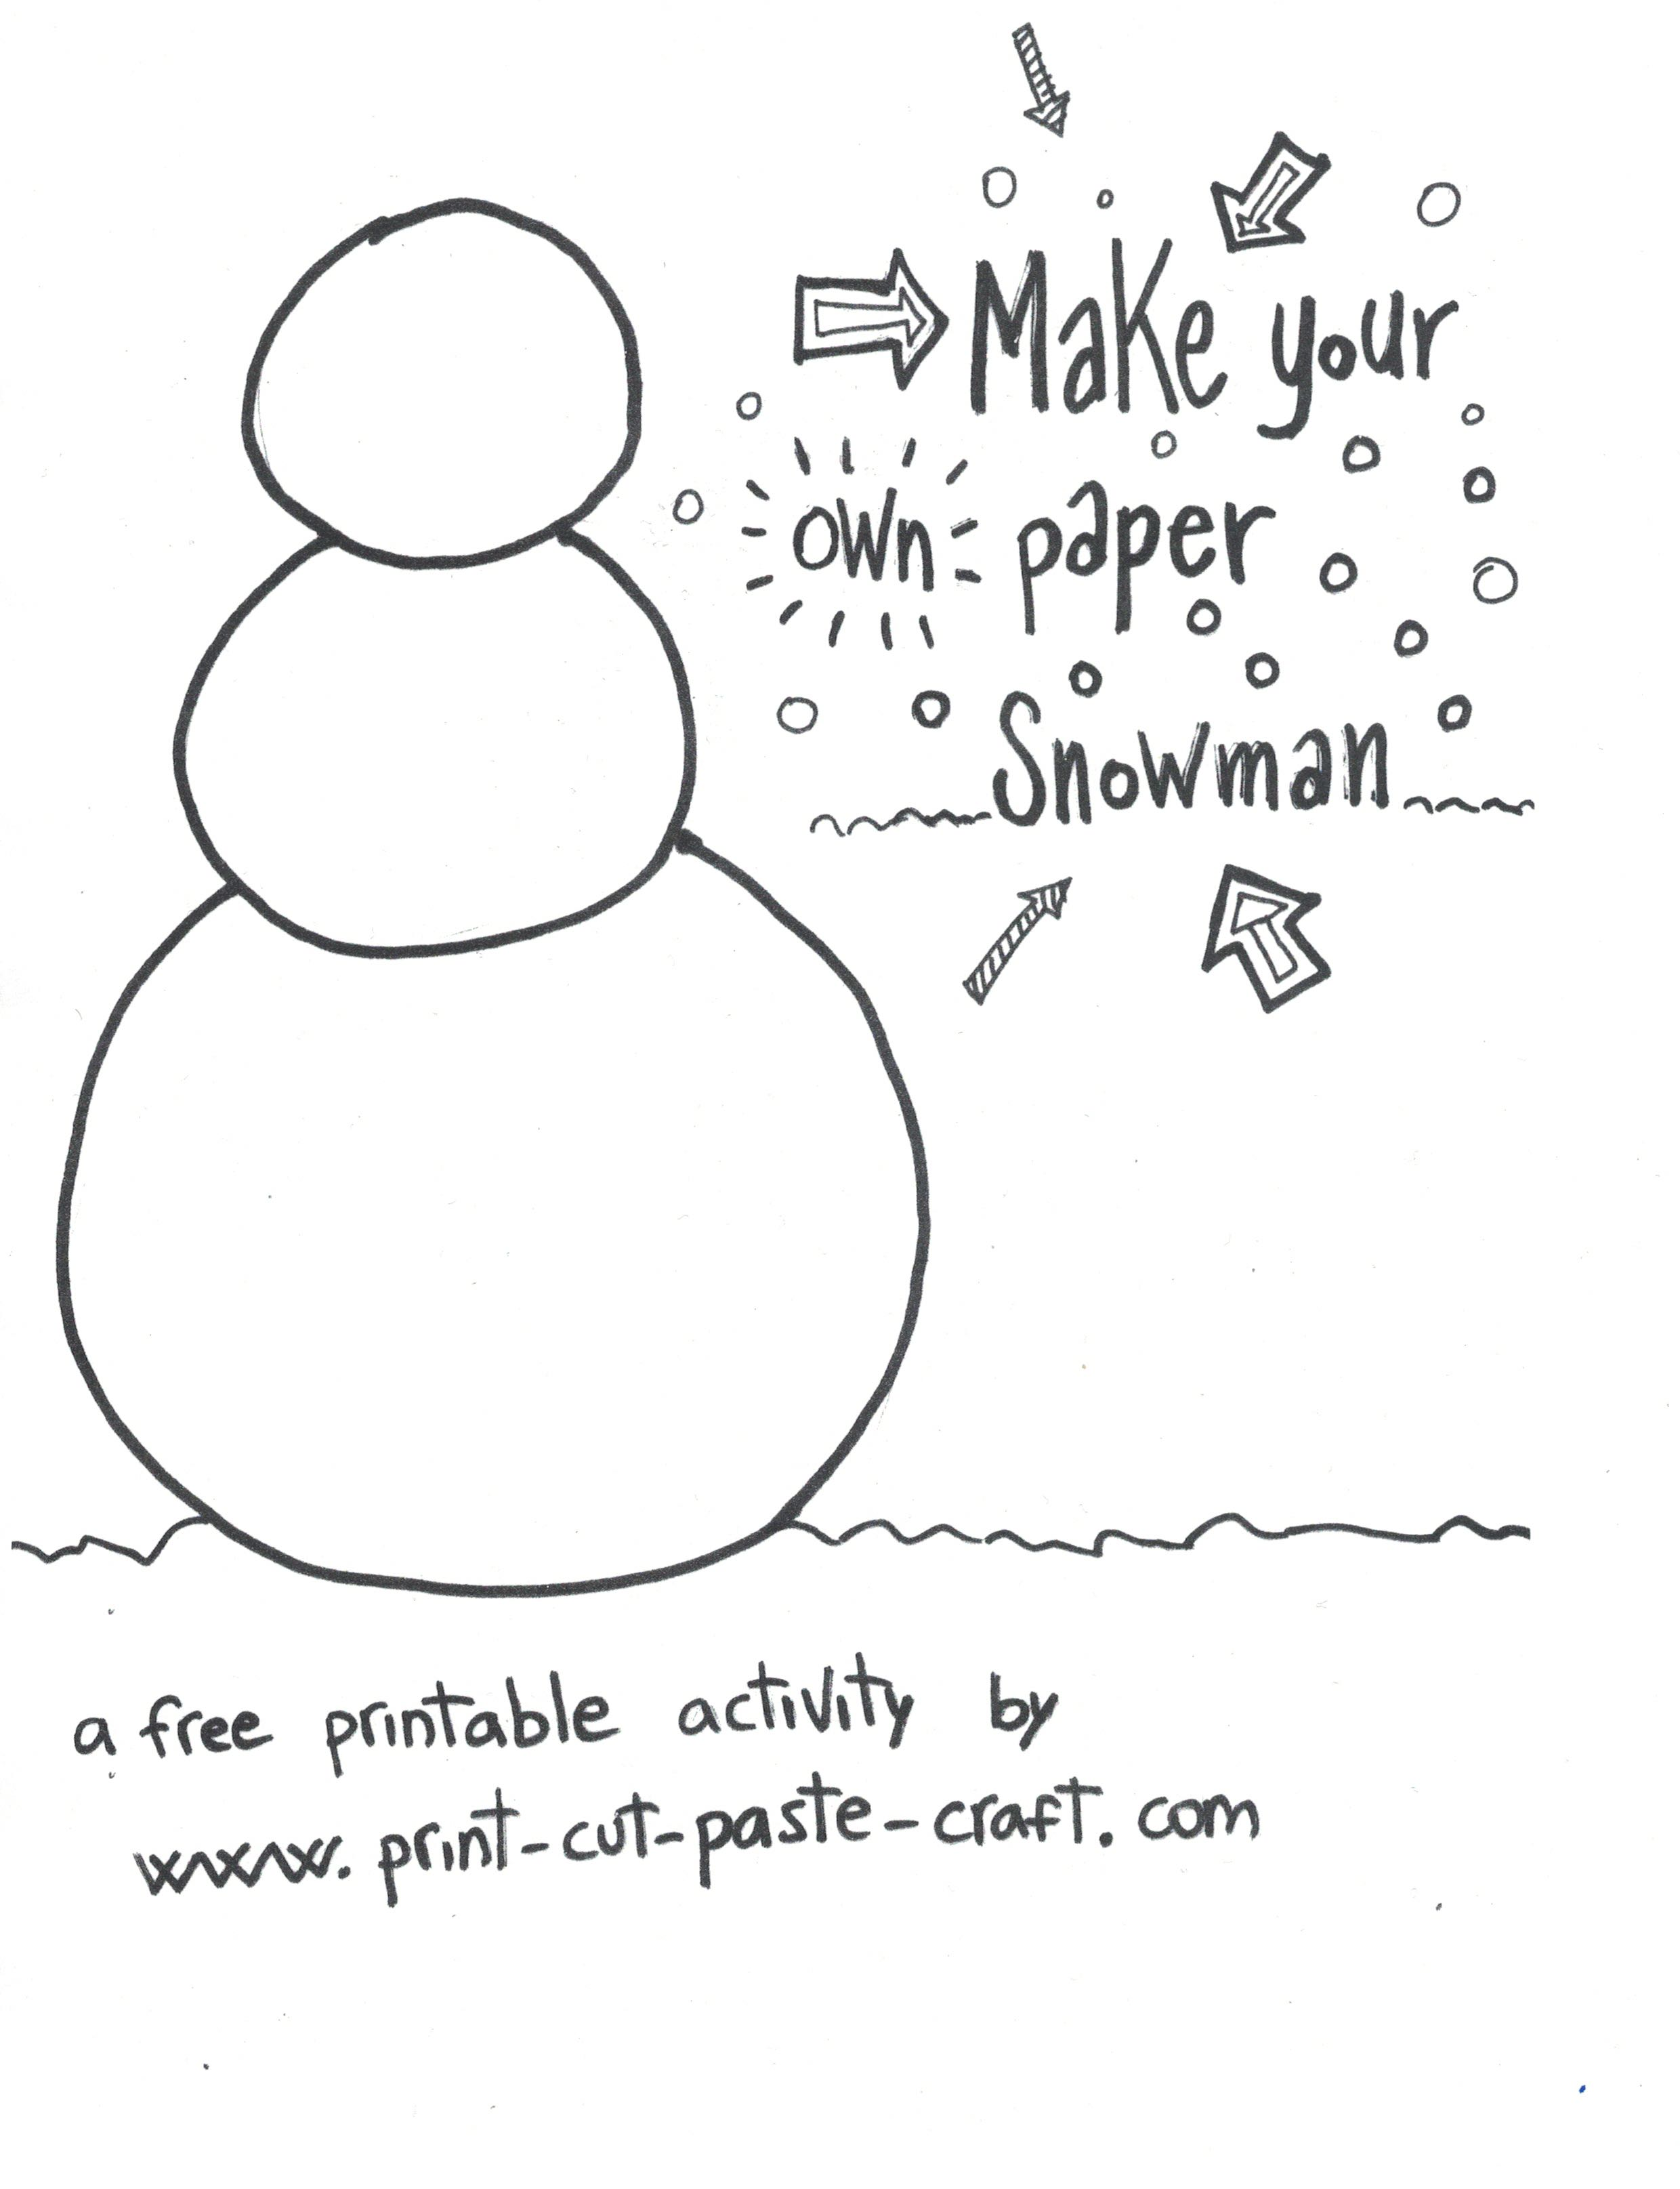 Print Cut Paste Craft